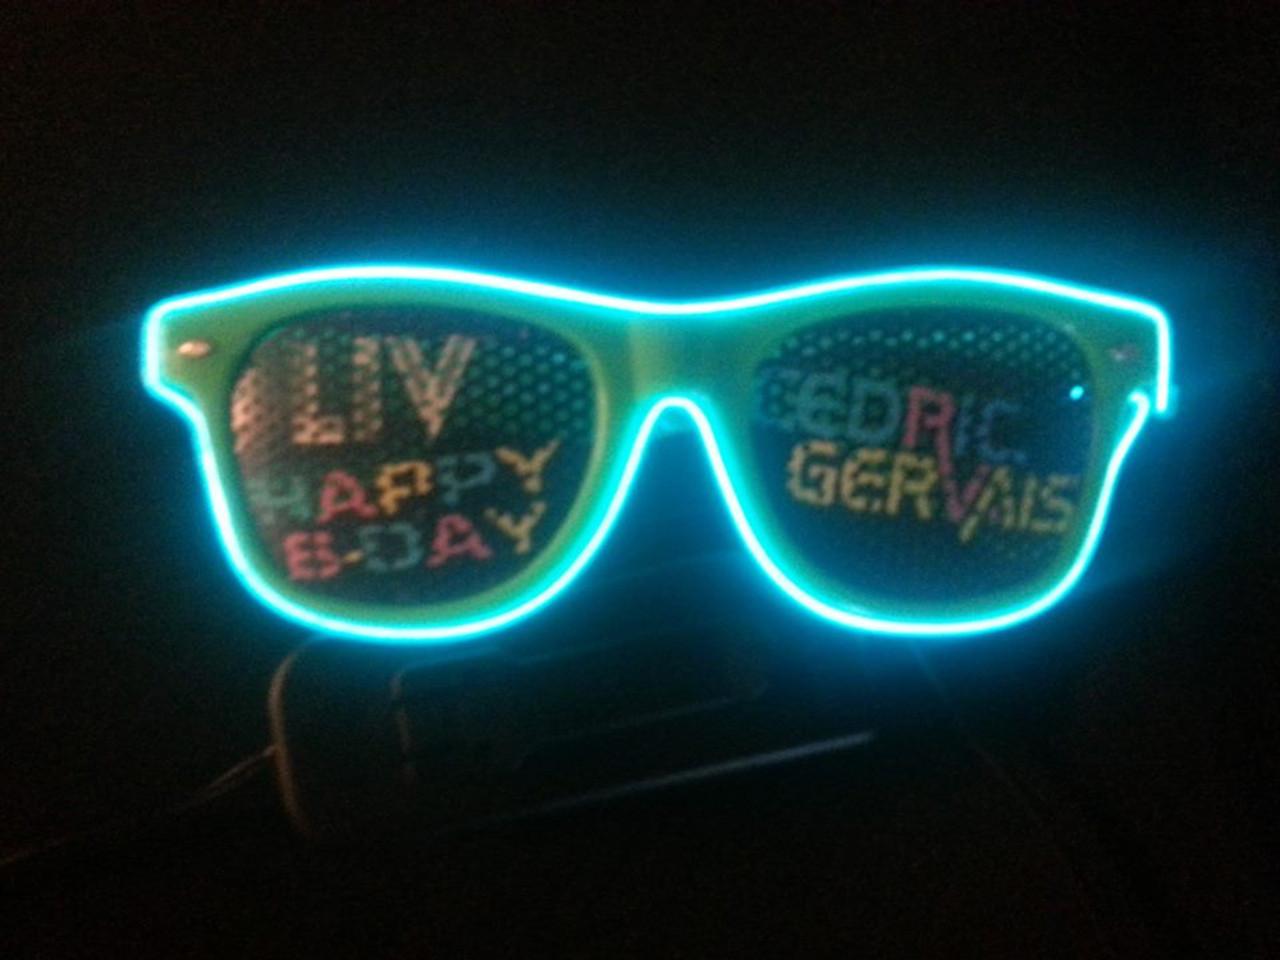 Led, Glasses, Sun Glasses, EDM wear, EDM, Electro, Sunglasses, Party, Nightclub, Custom, Glow, lenses, light up, lit, liv, lightuo